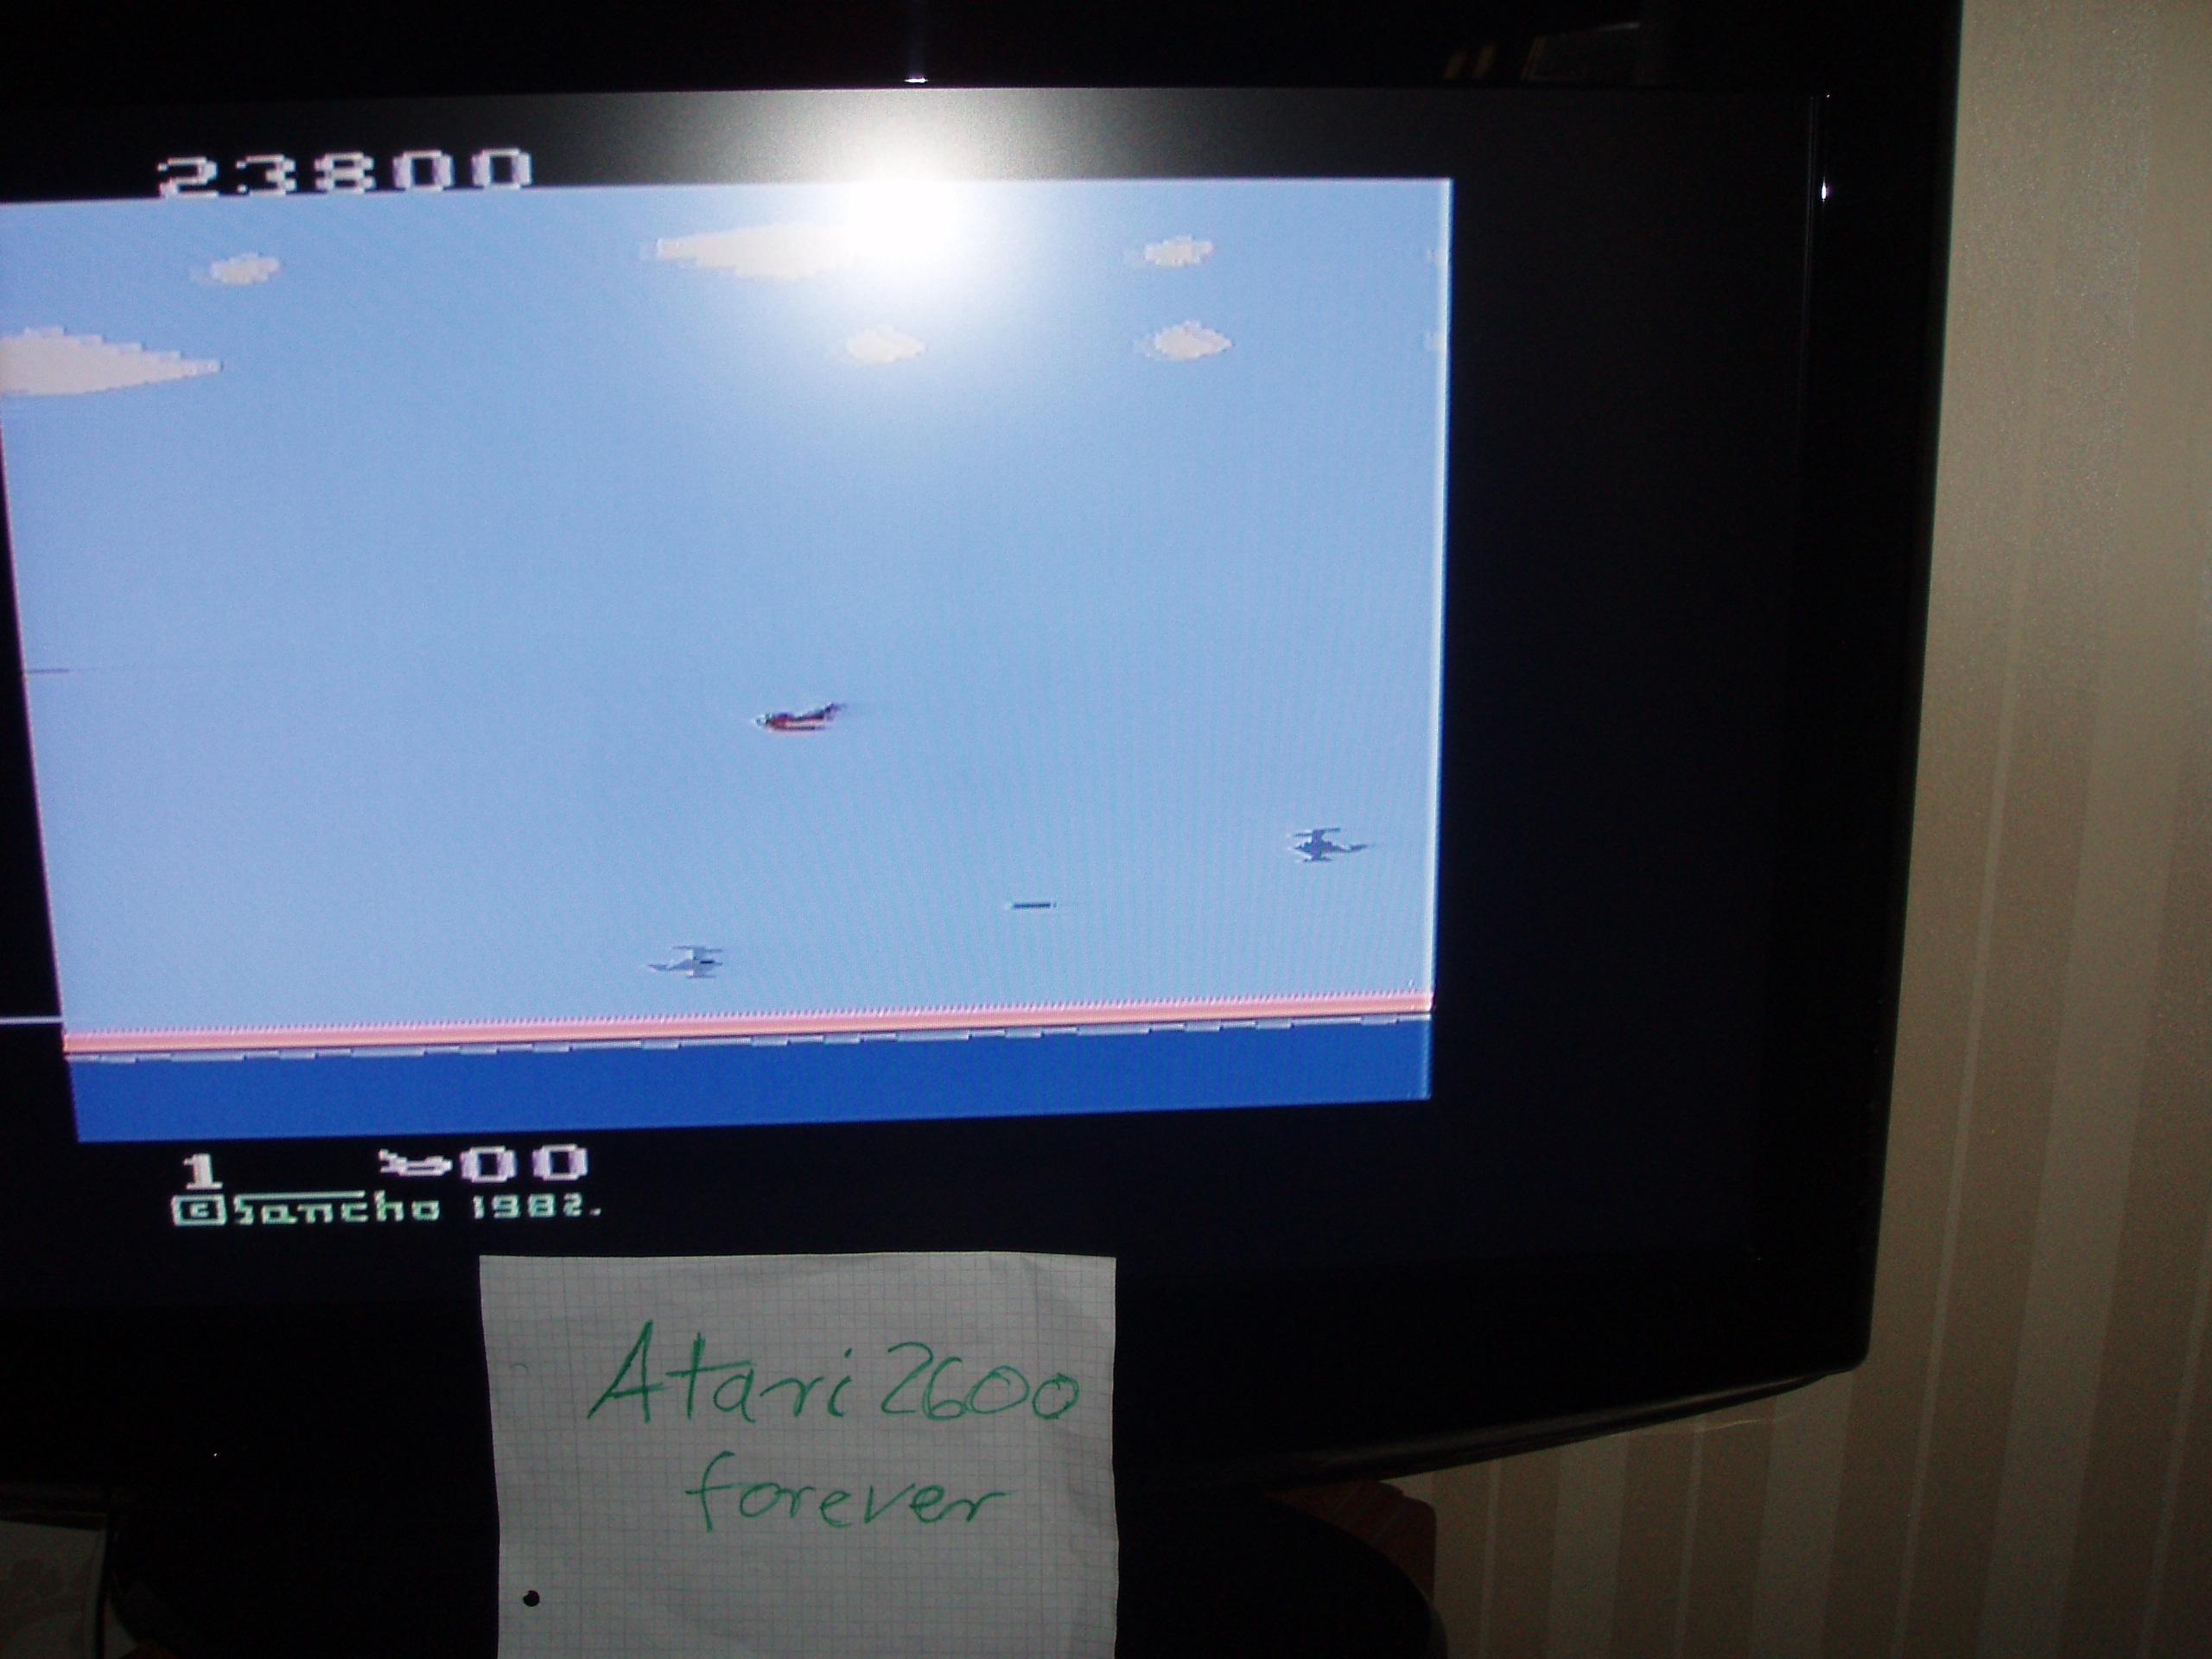 atari2600forever: Sea Hawk (Atari 2600 Novice/B) 23,800 points on 2015-12-14 10:20:21